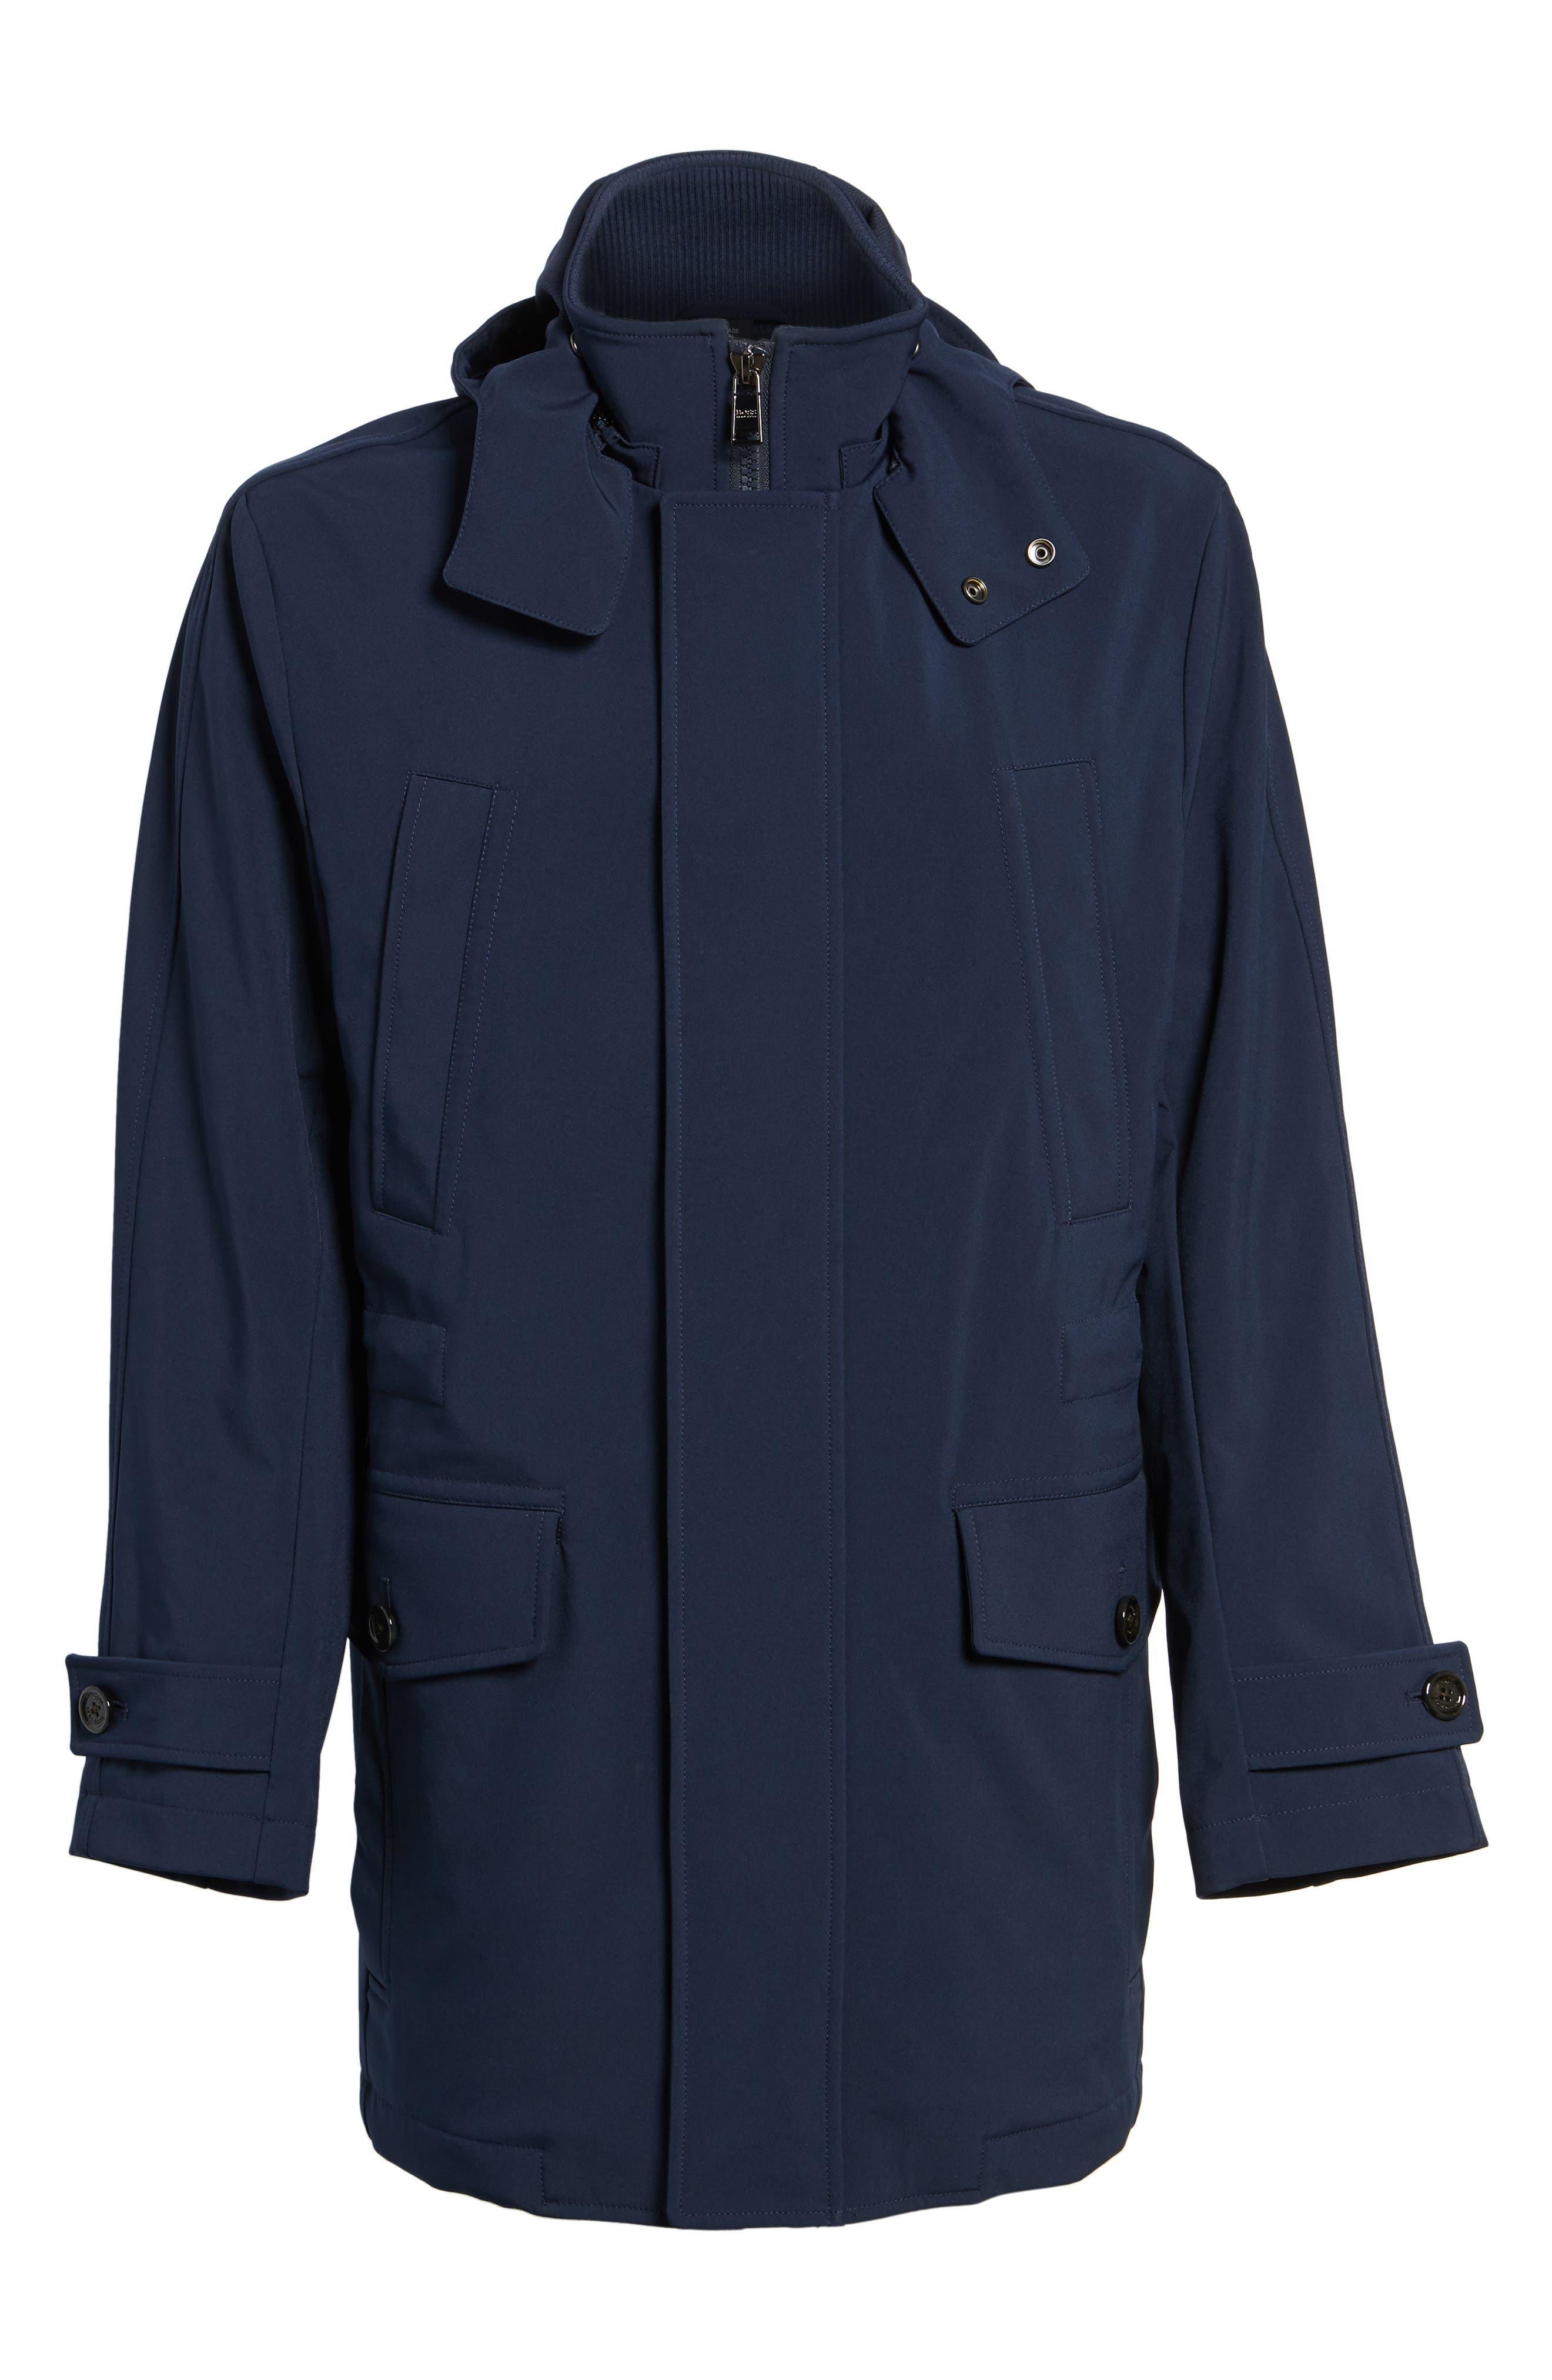 Technical Longline Jacket,                             Alternate thumbnail 5, color,                             Navy